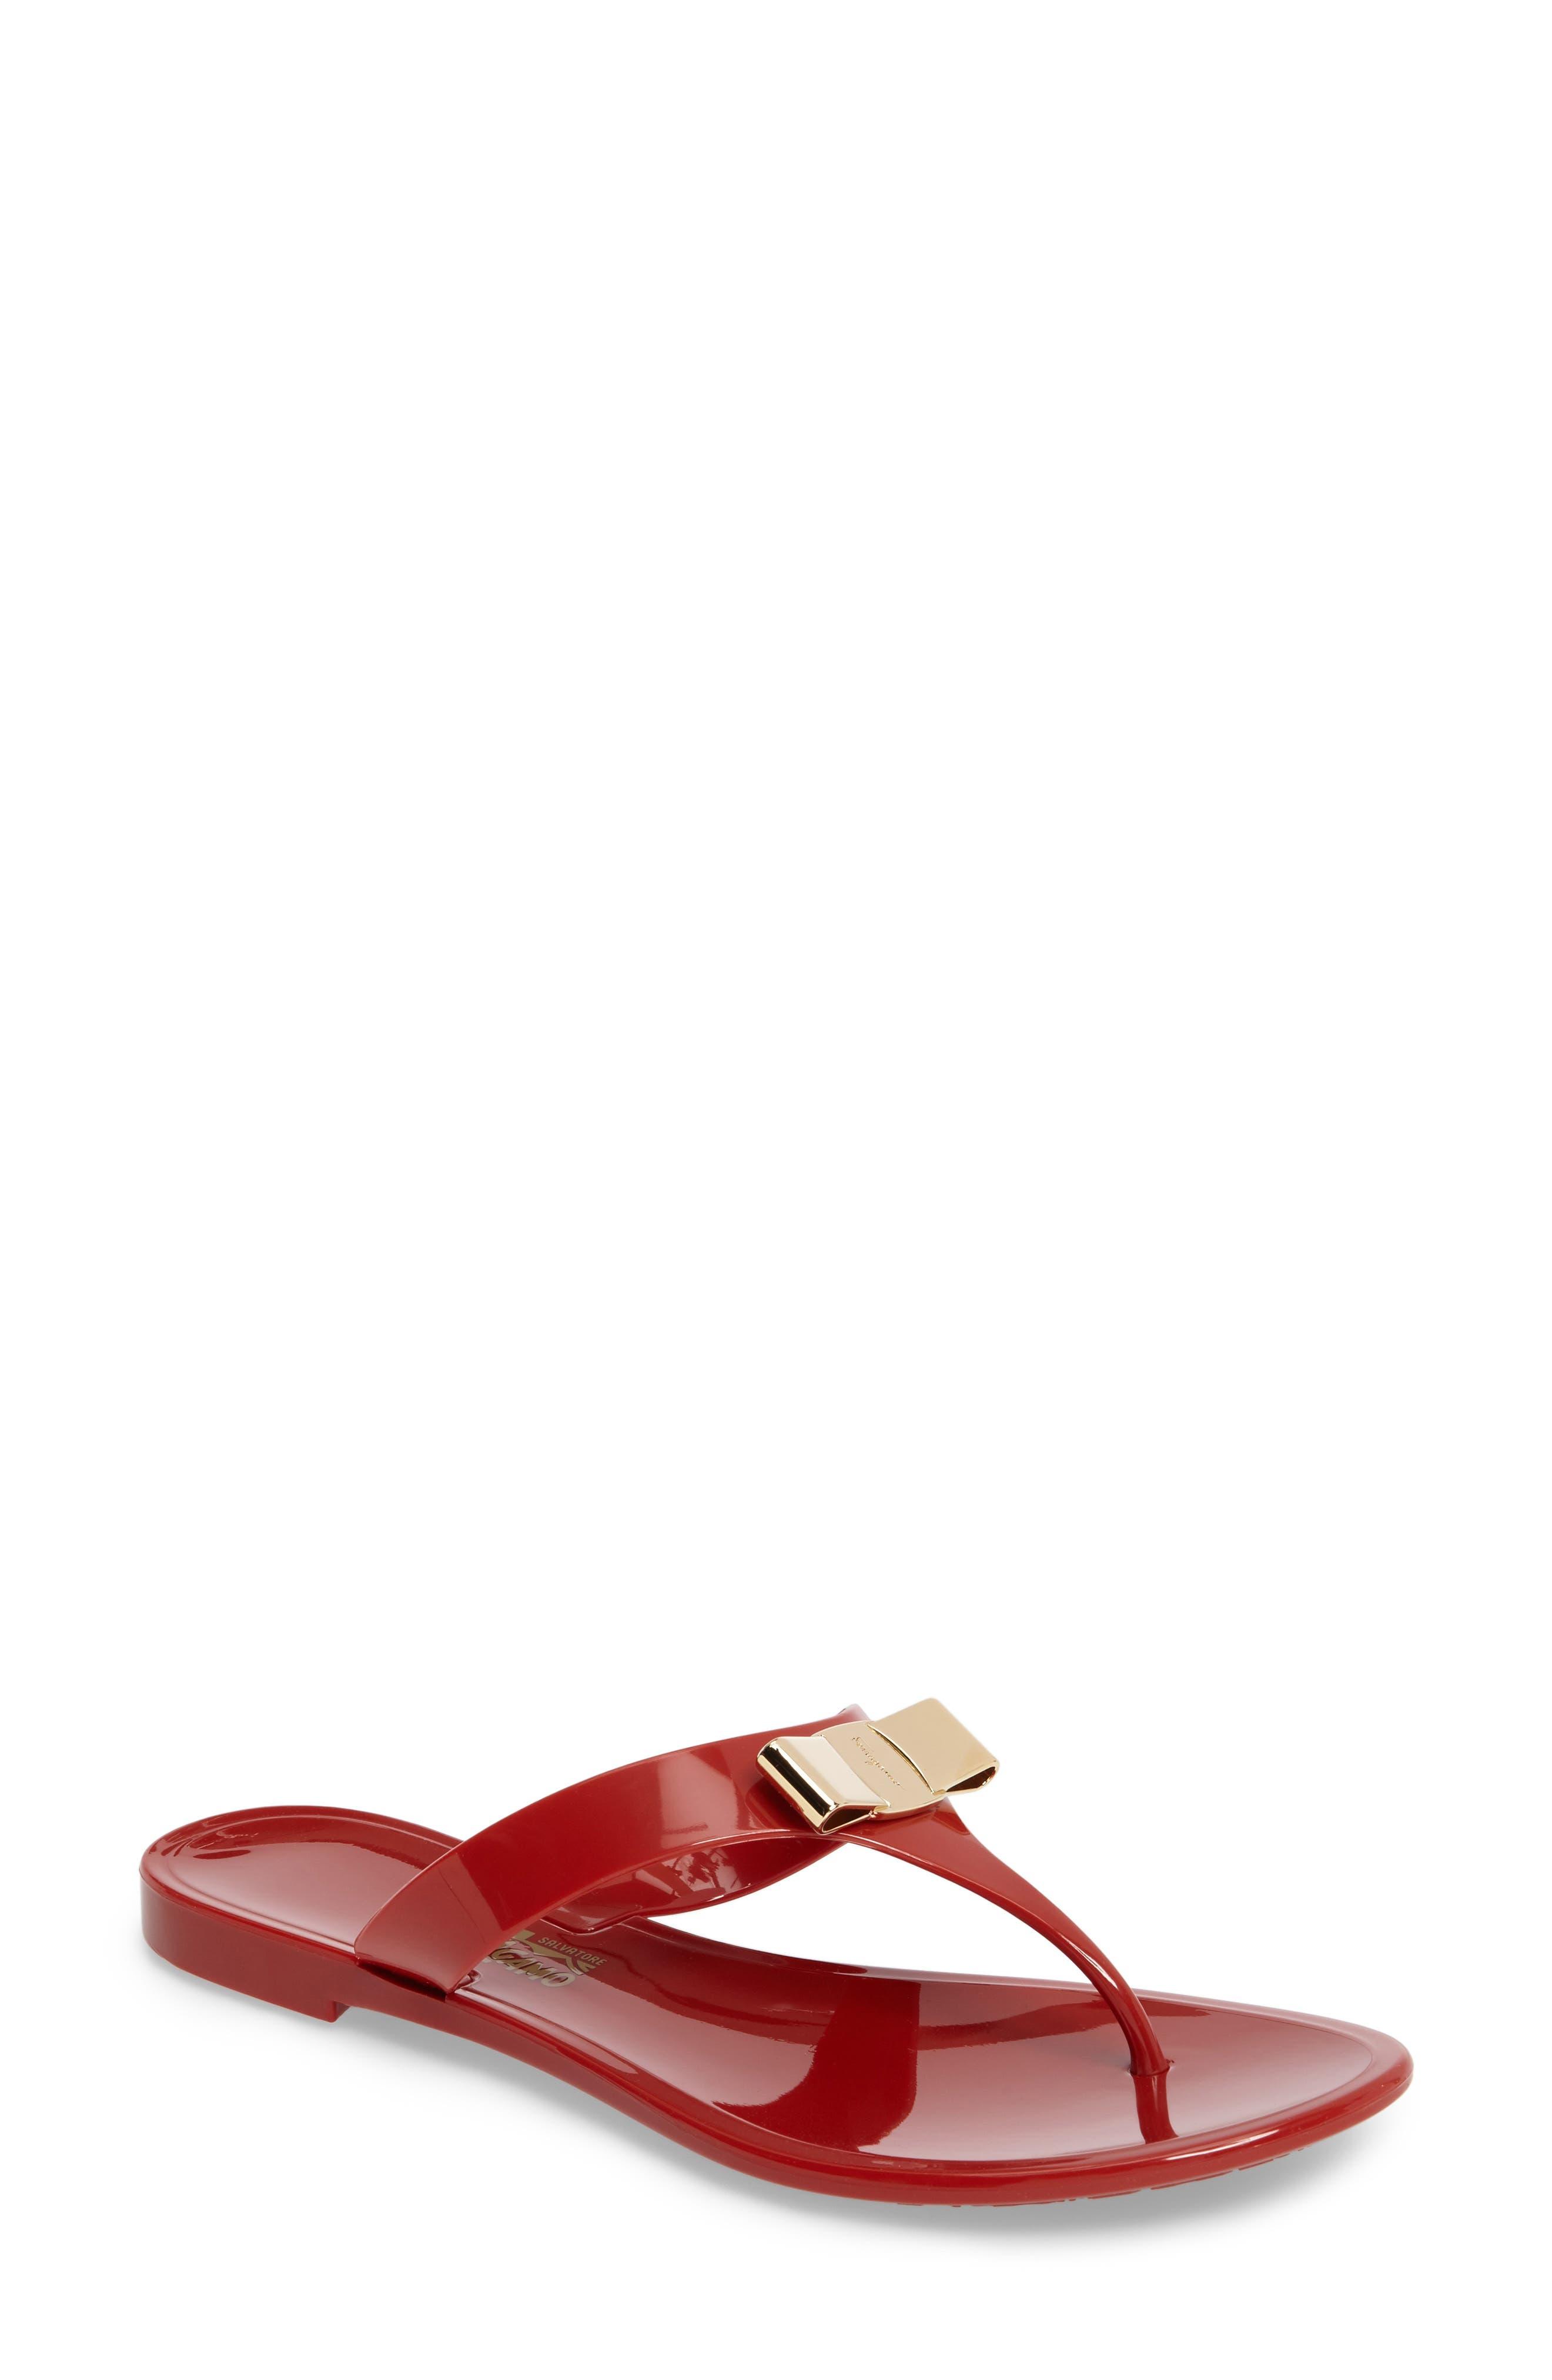 Farelia Jelly Flat Bow Sandal,                             Main thumbnail 1, color,                             Red Pvc